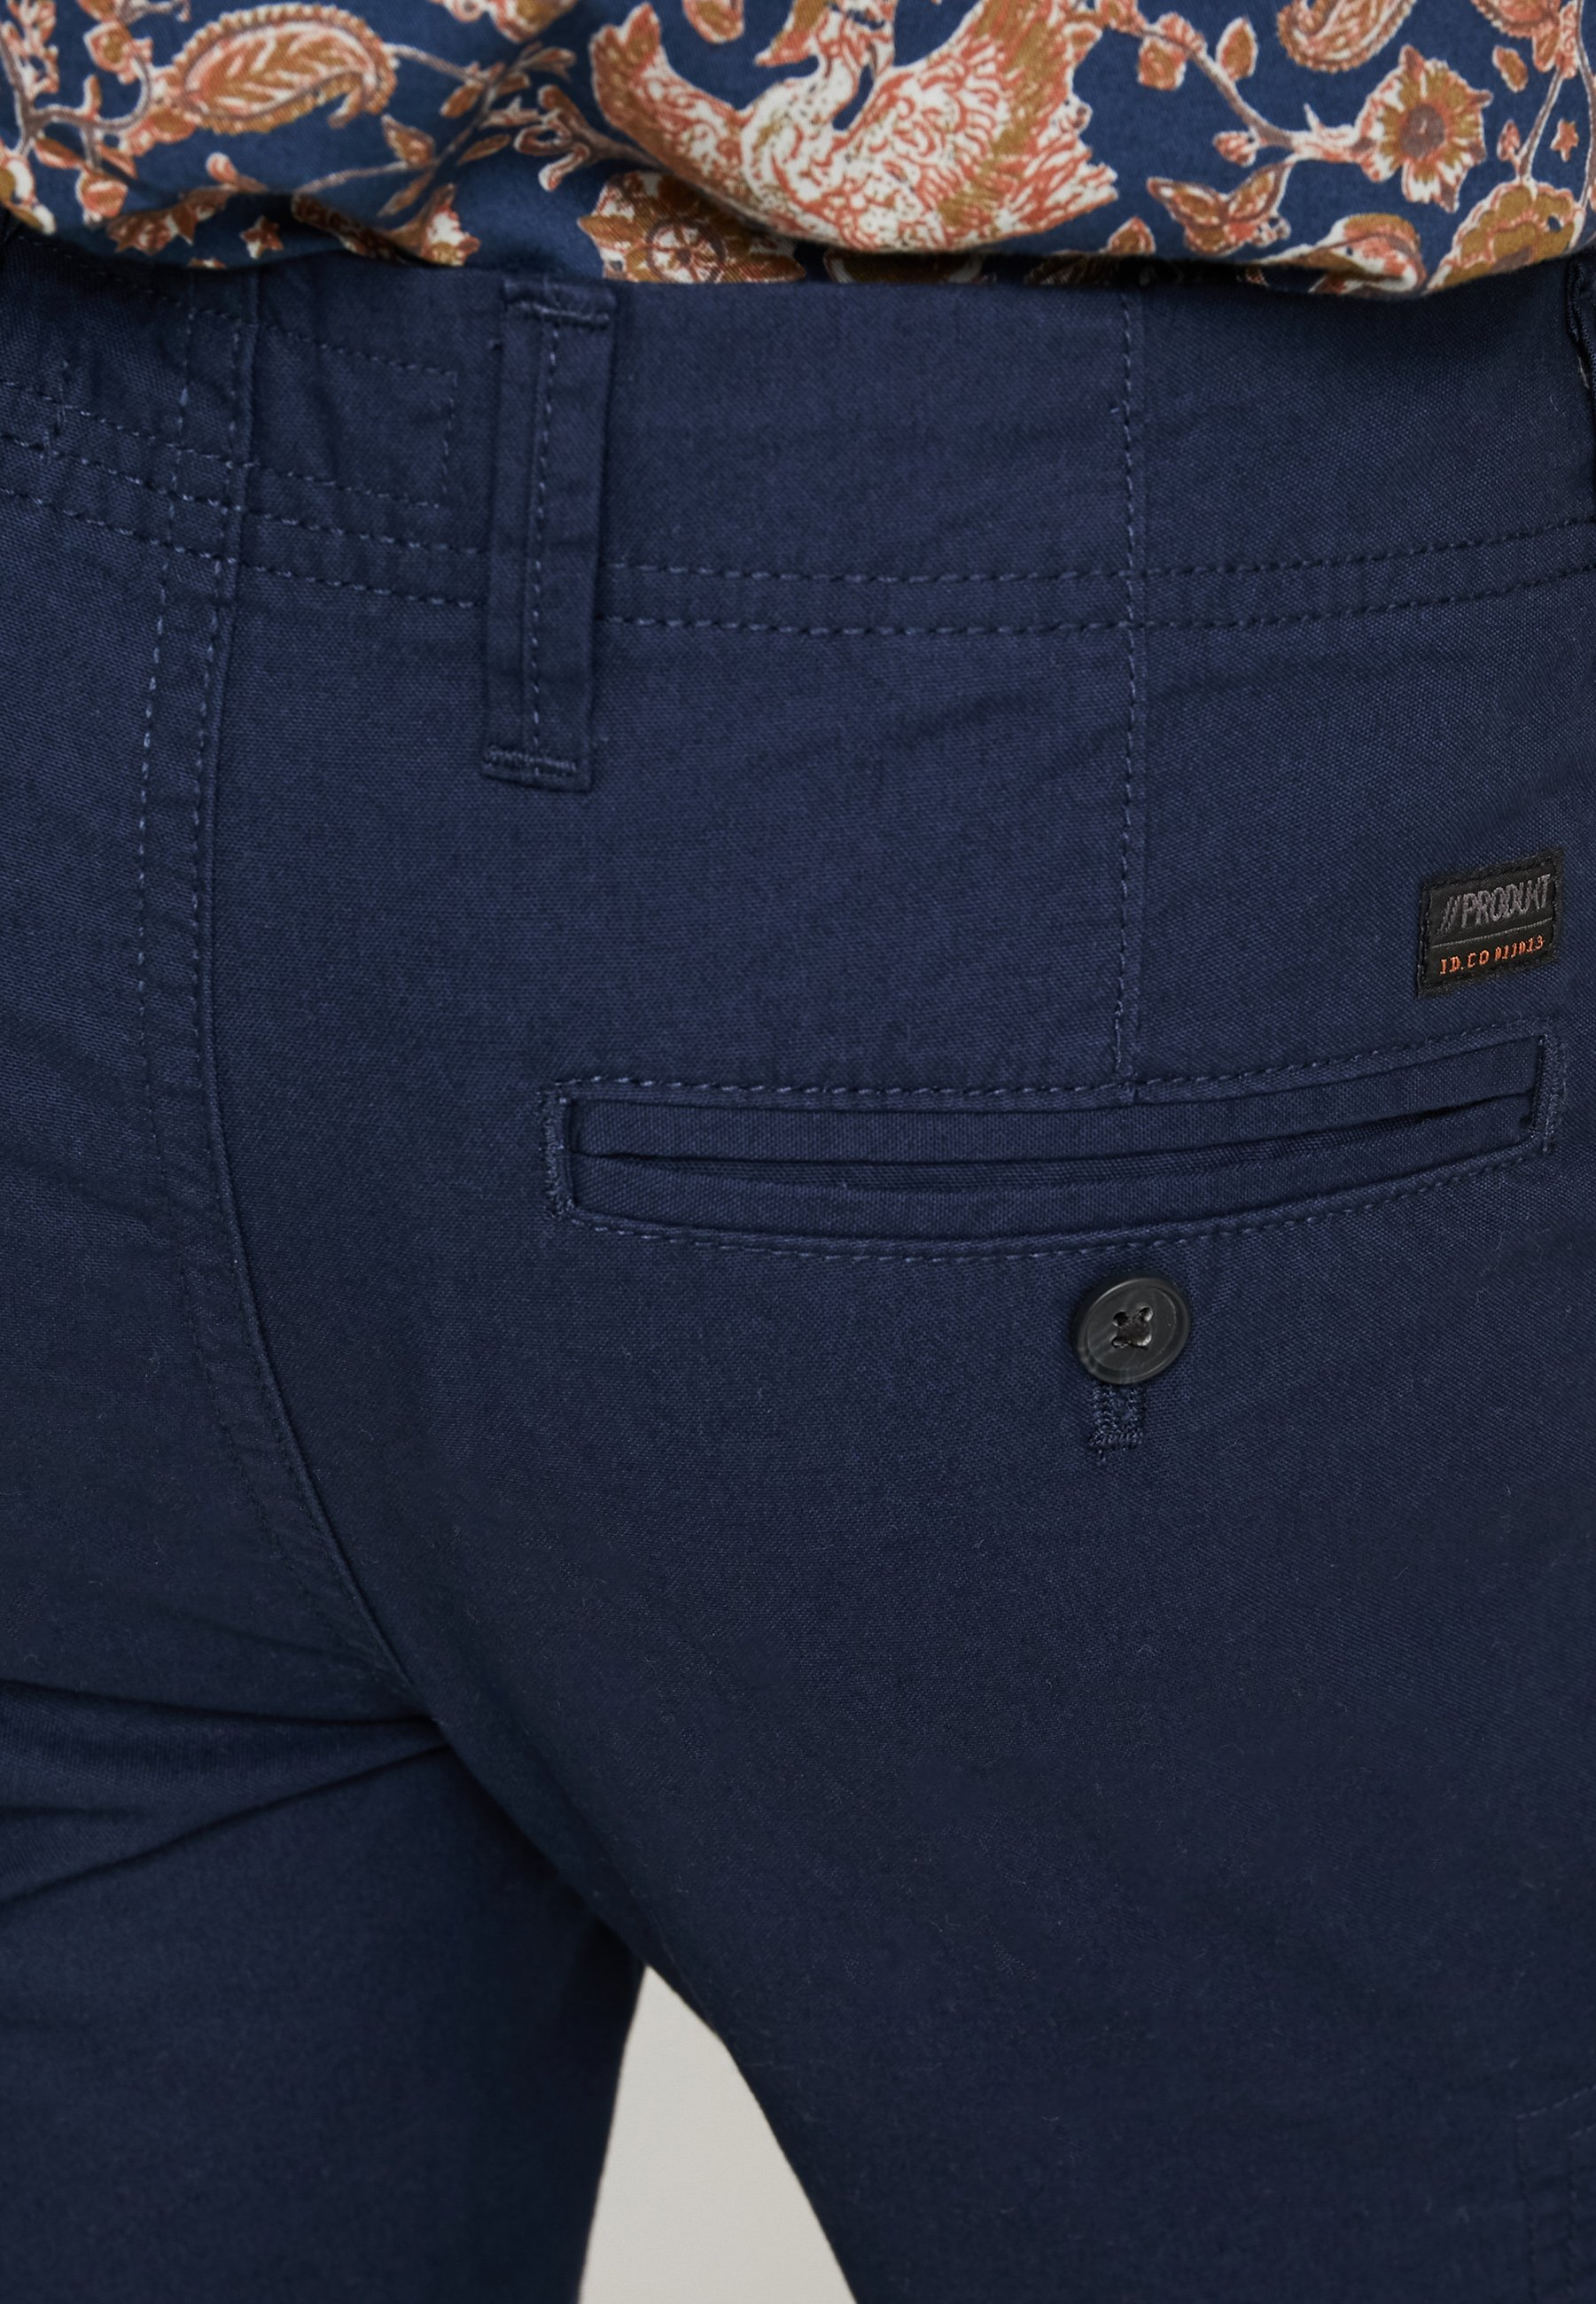 Homme PKTAKM WASHED CUFF  - Pantalon cargo